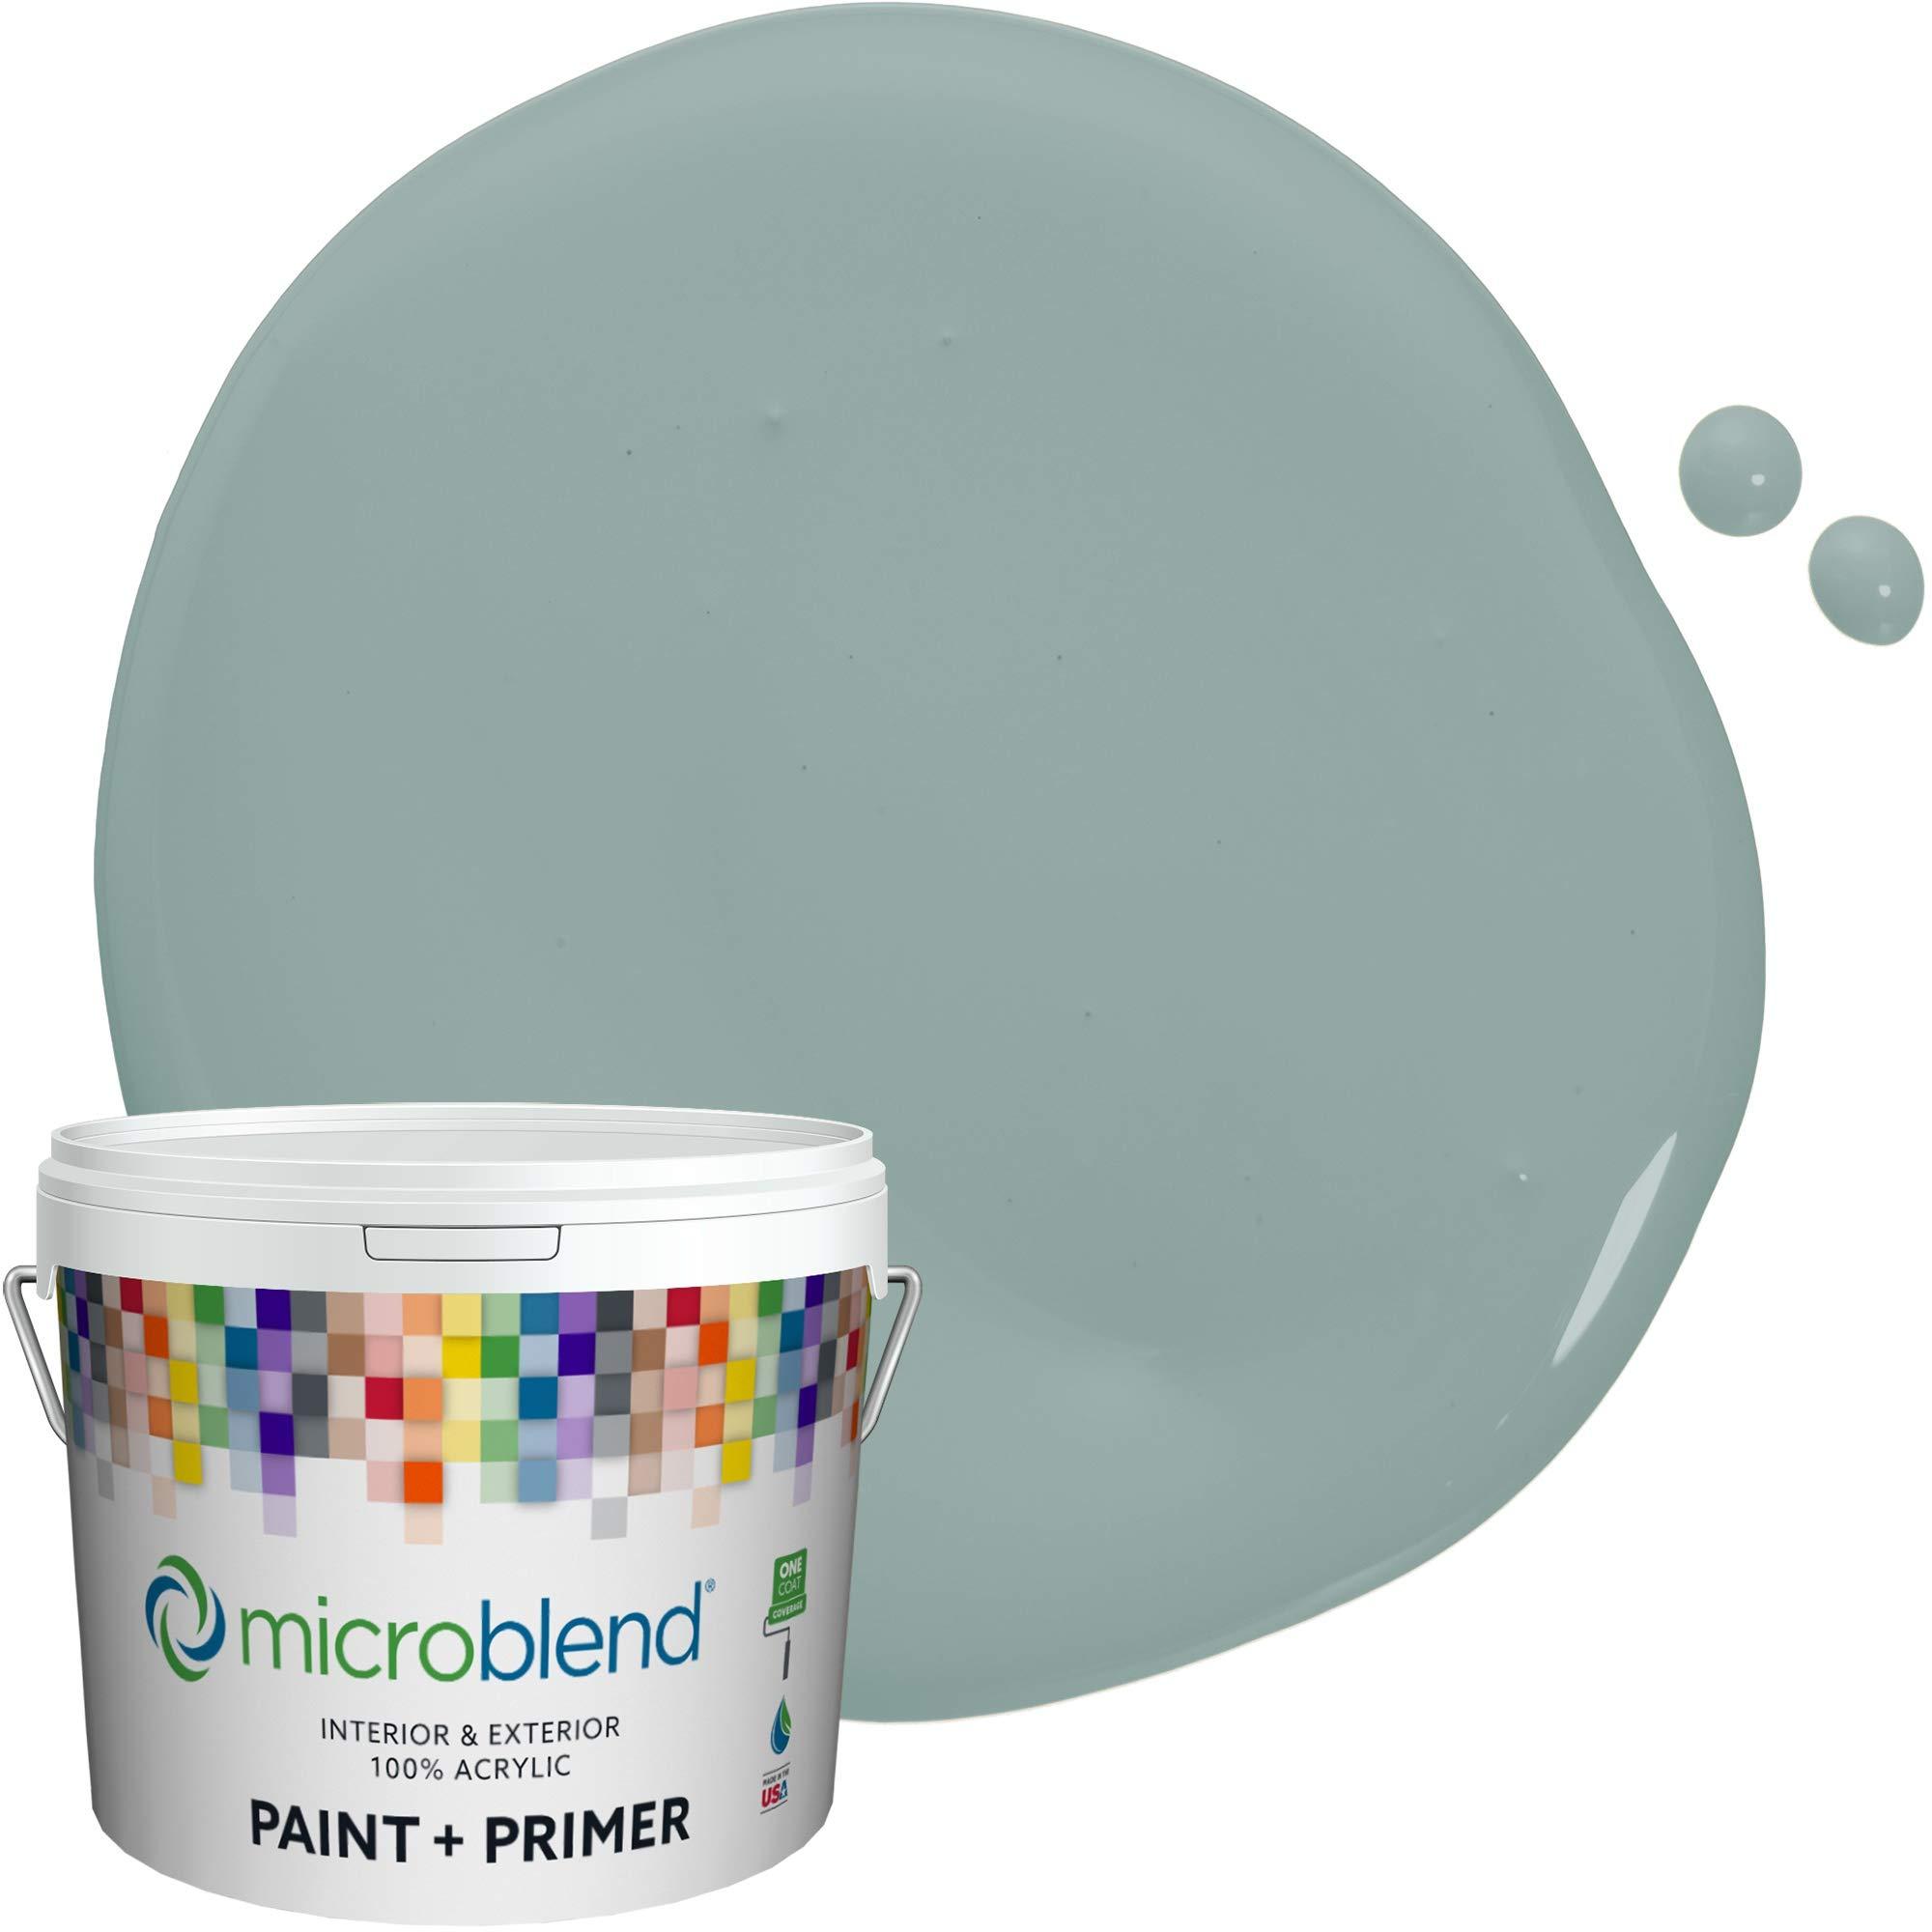 MicroBlend Interior Paint + Primer, Fresh Aqua, Flat Sheen, 1 Gallon, Custom Made, Premium Quality One Coat Hide & Washable Paint (73212-2-M1466B3(C))